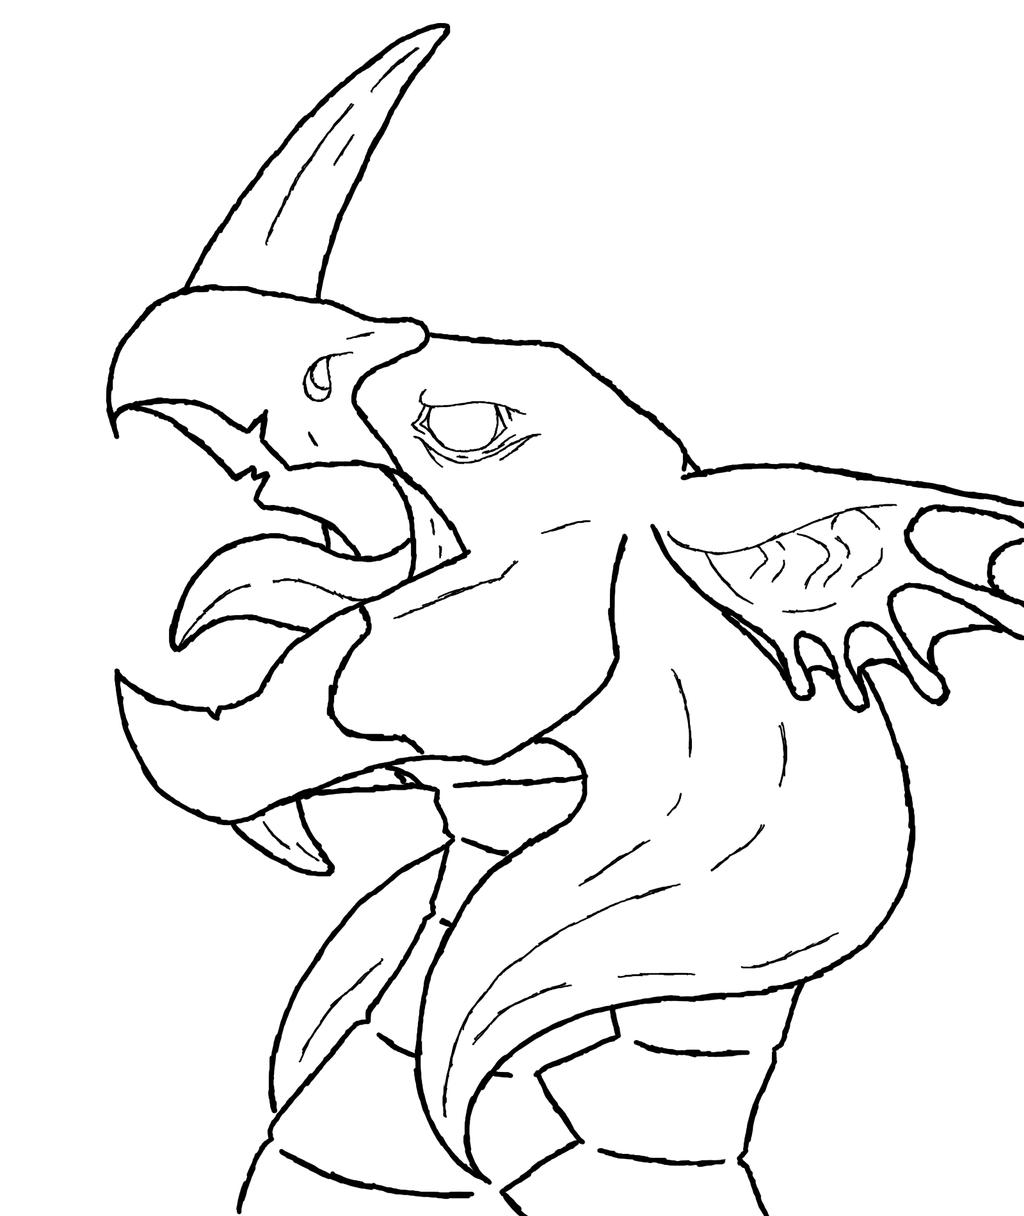 Line Drawing Head : Dragon head line art by holderofpeace on deviantart